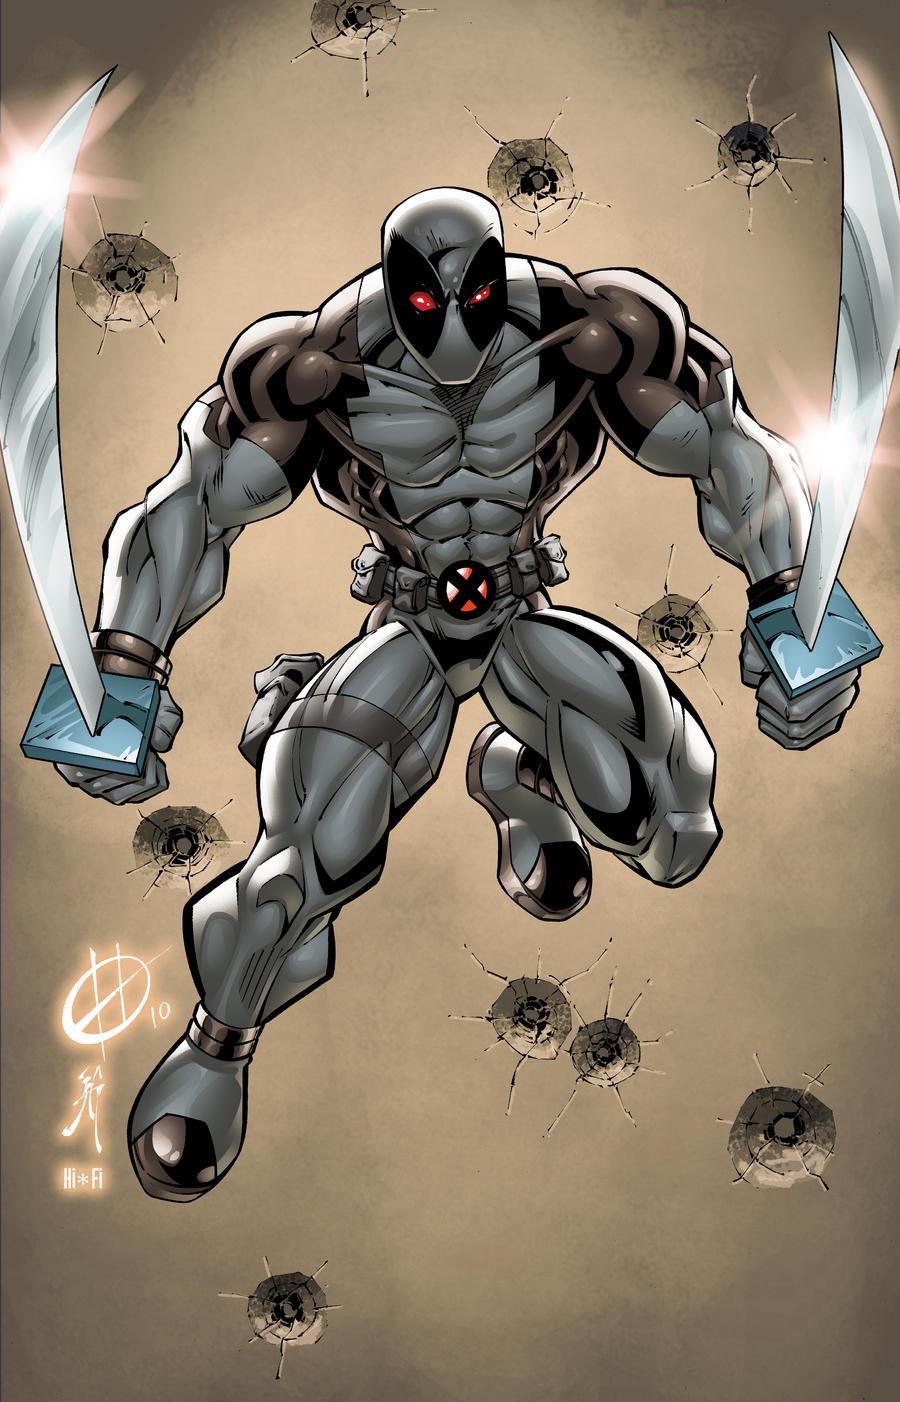 X Force Deadpool Premium Format Sidesho...